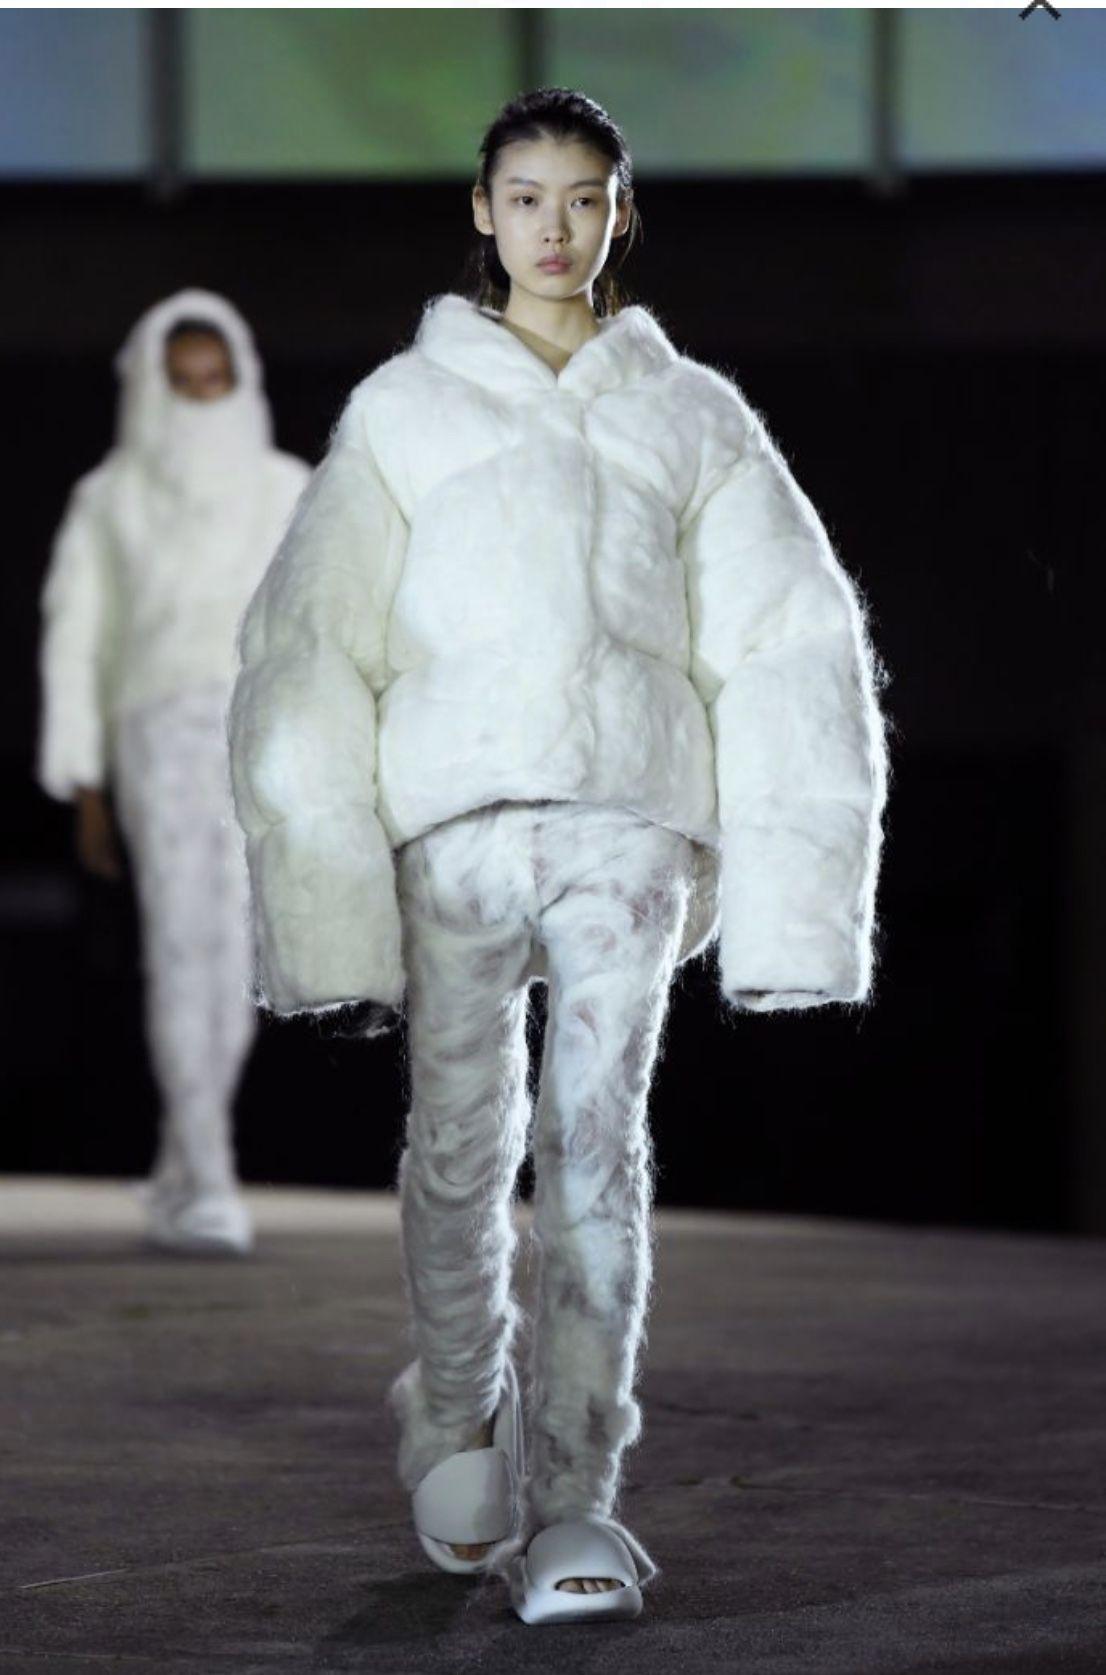 Paris Fashion Week Kanye West Yeezy Season 8 In 2020 Fashion Paris Fashion Week Yeezy Season